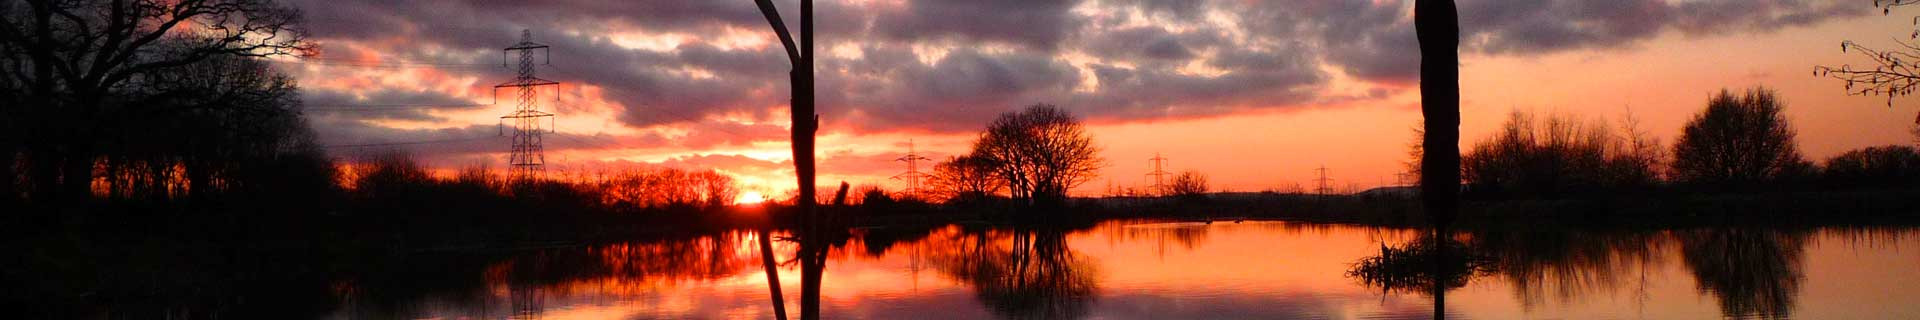 Furzebray Carp Lakes at Sunset